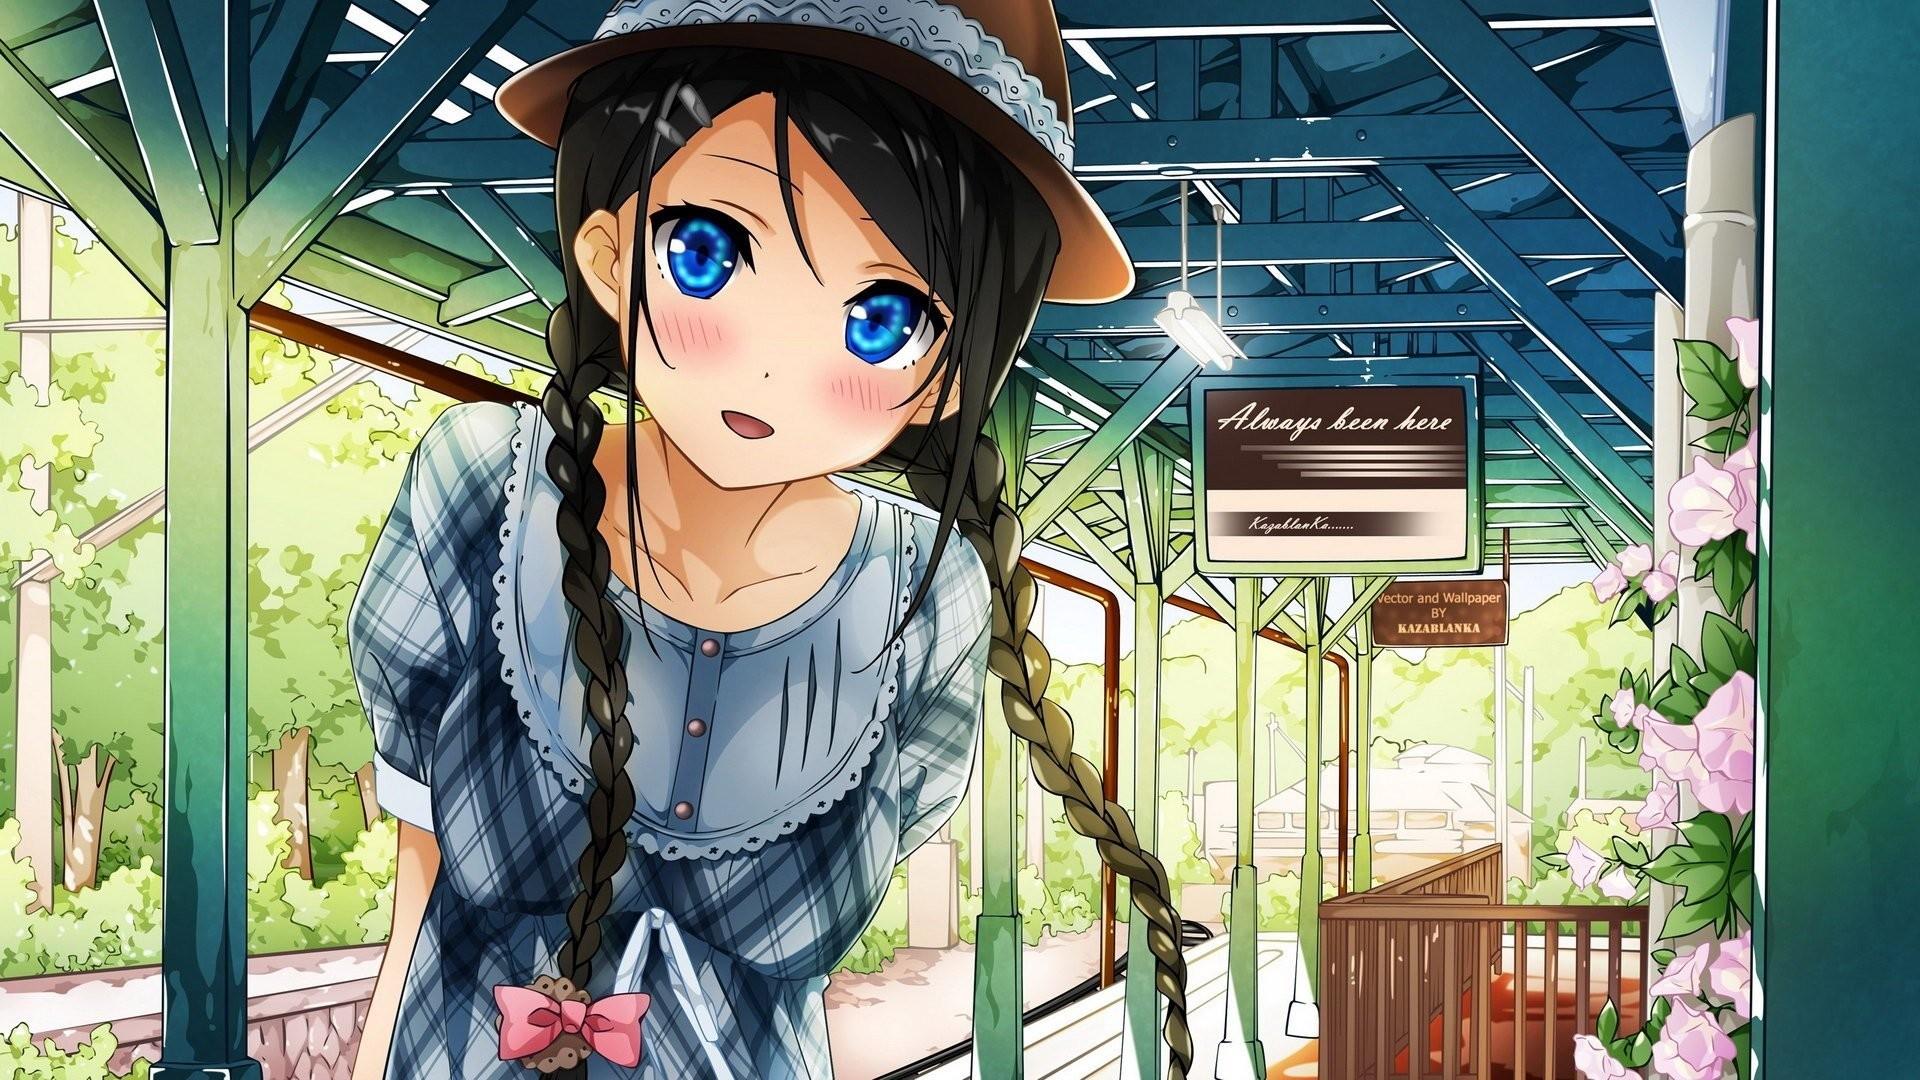 Cute Anime Girl Background